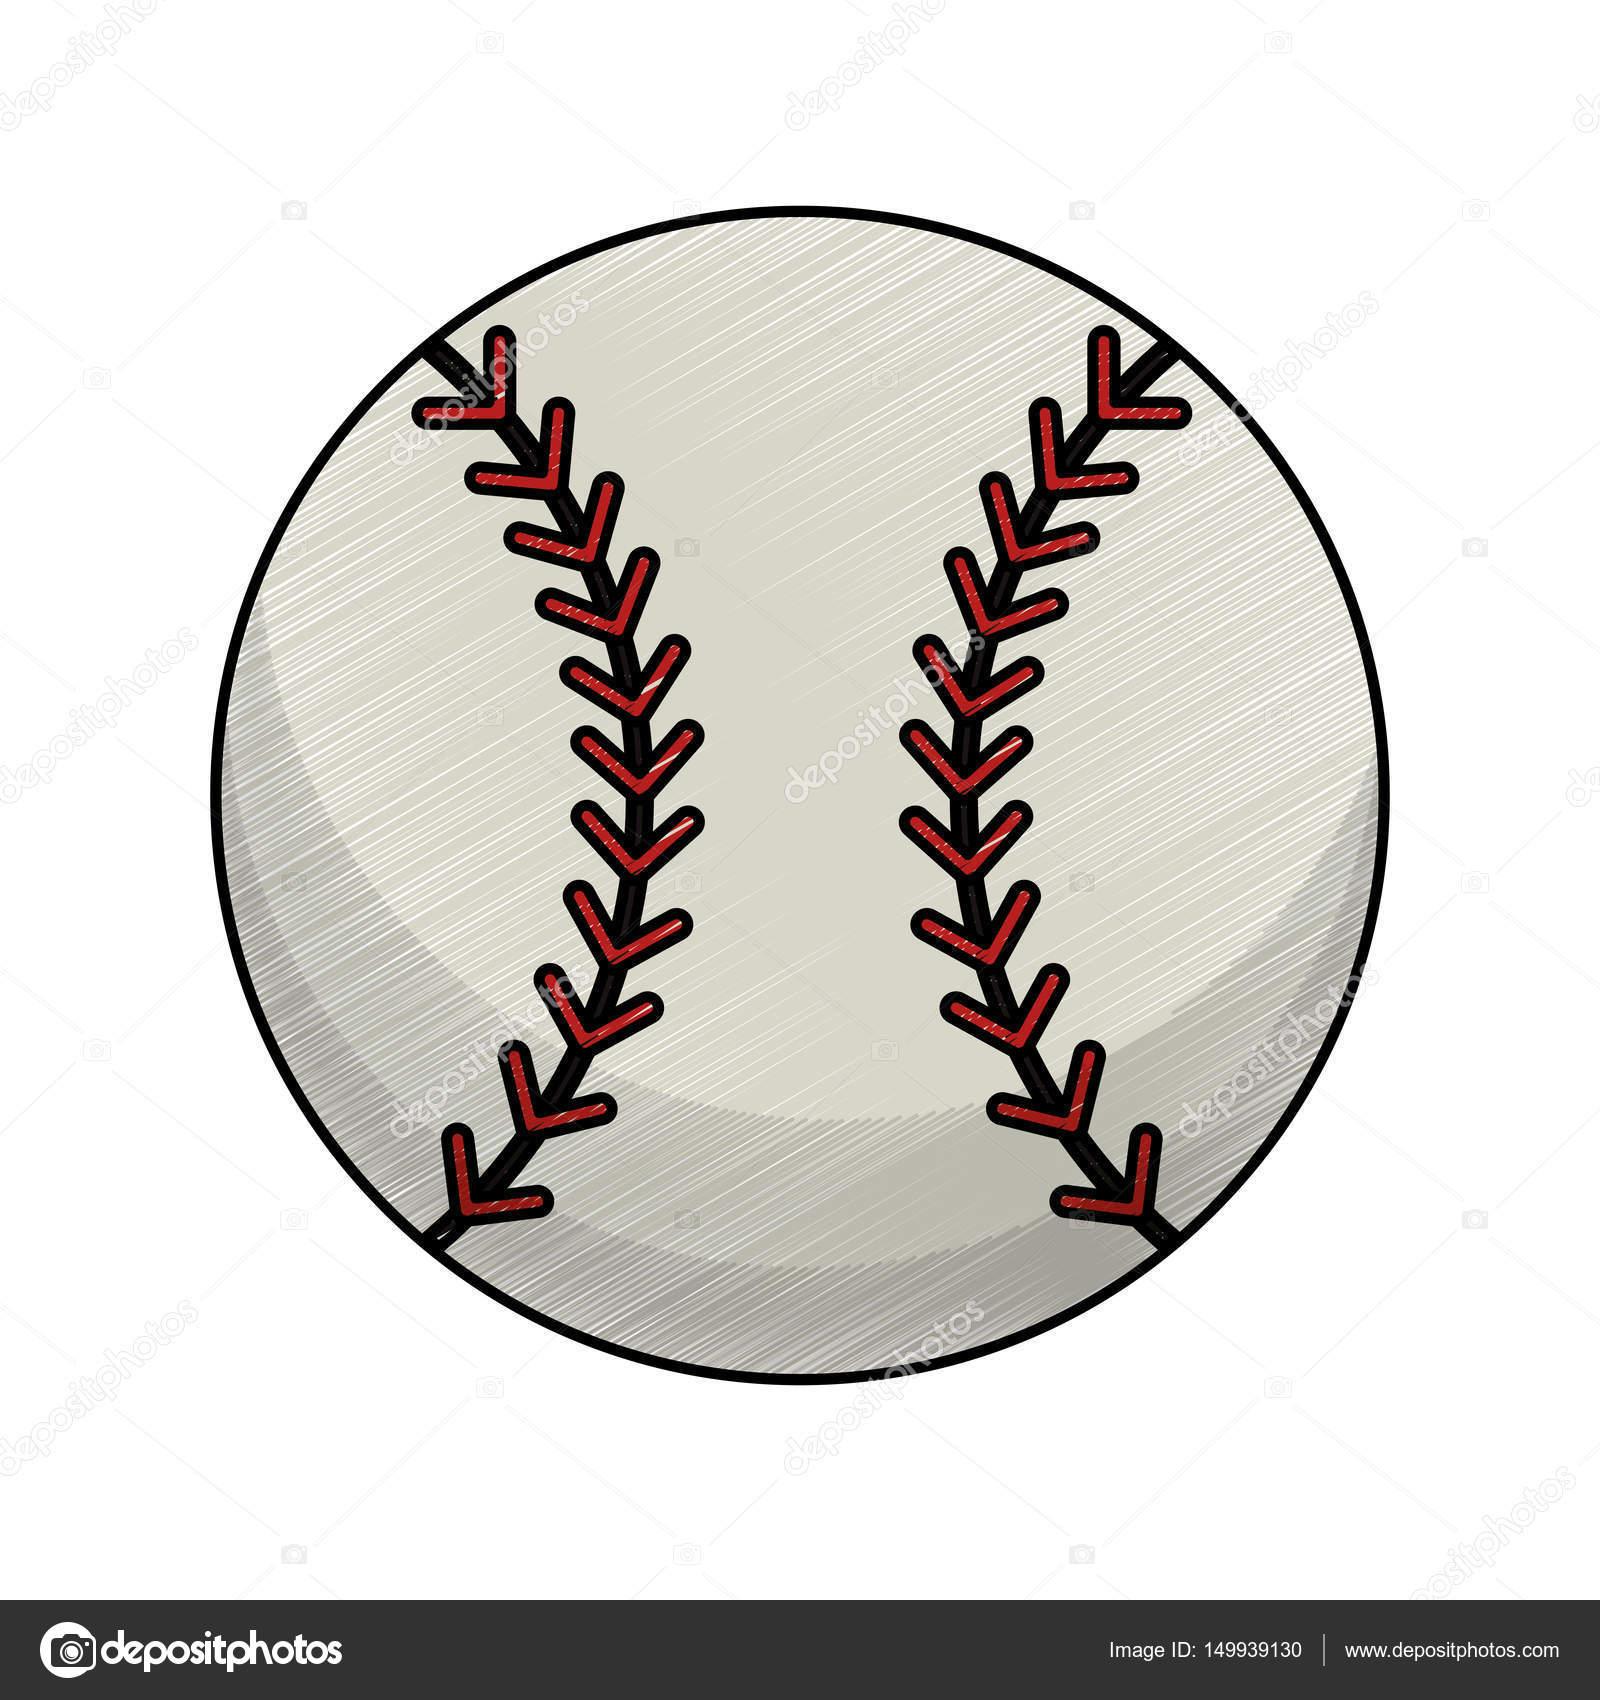 1600x1700 Drawing Baseball Ball Equipment Stock Vector Jemastock